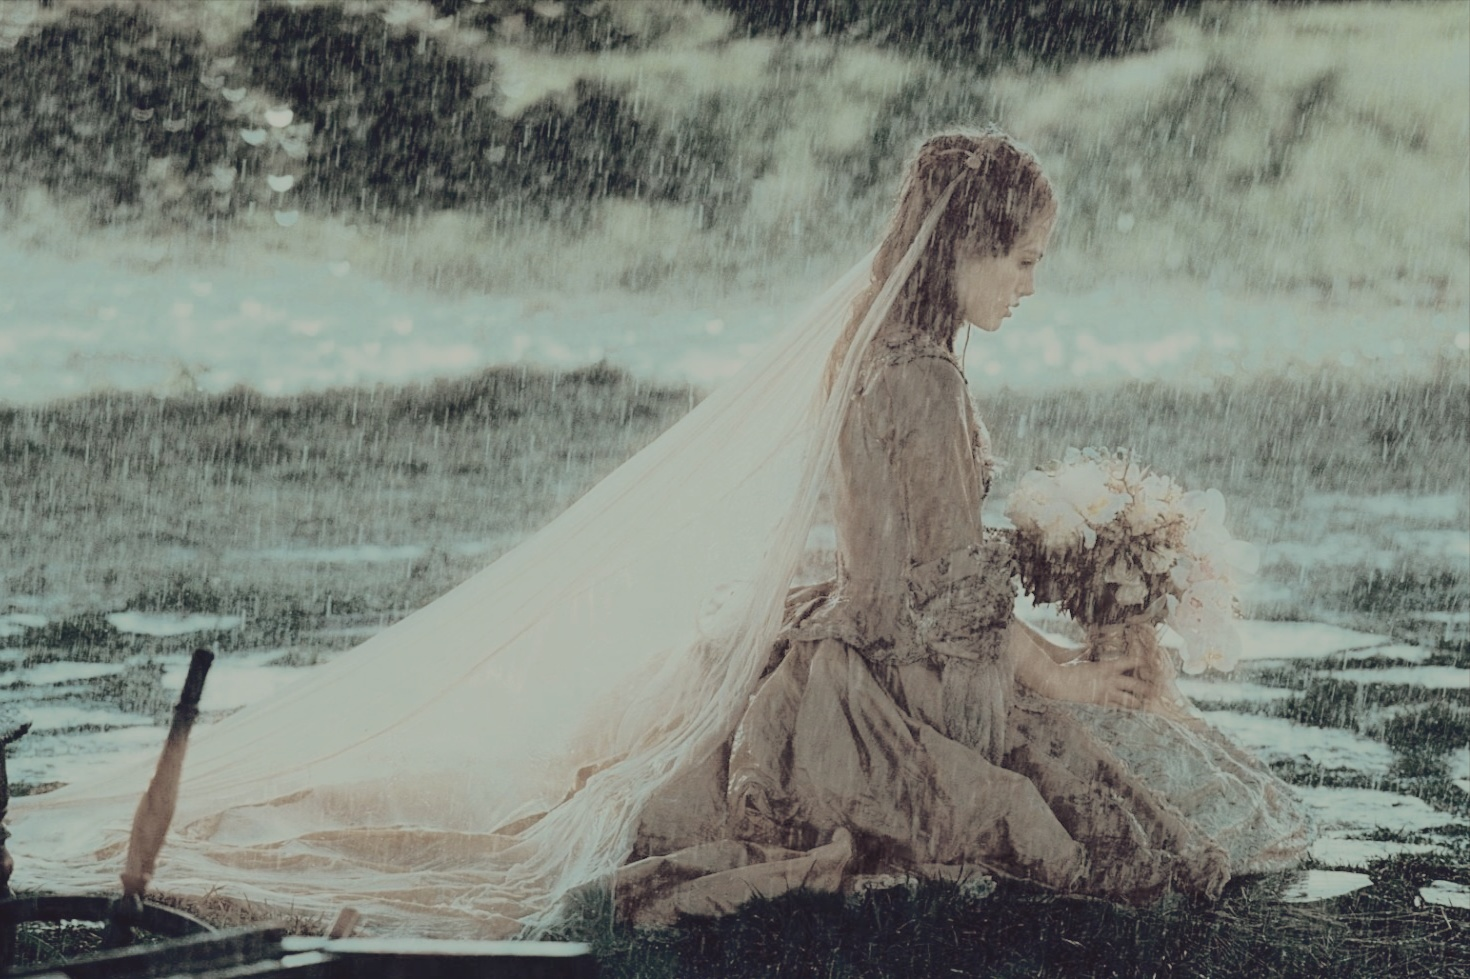 Puisi Cinta Sedih Yang Membuat Menangis Puisi